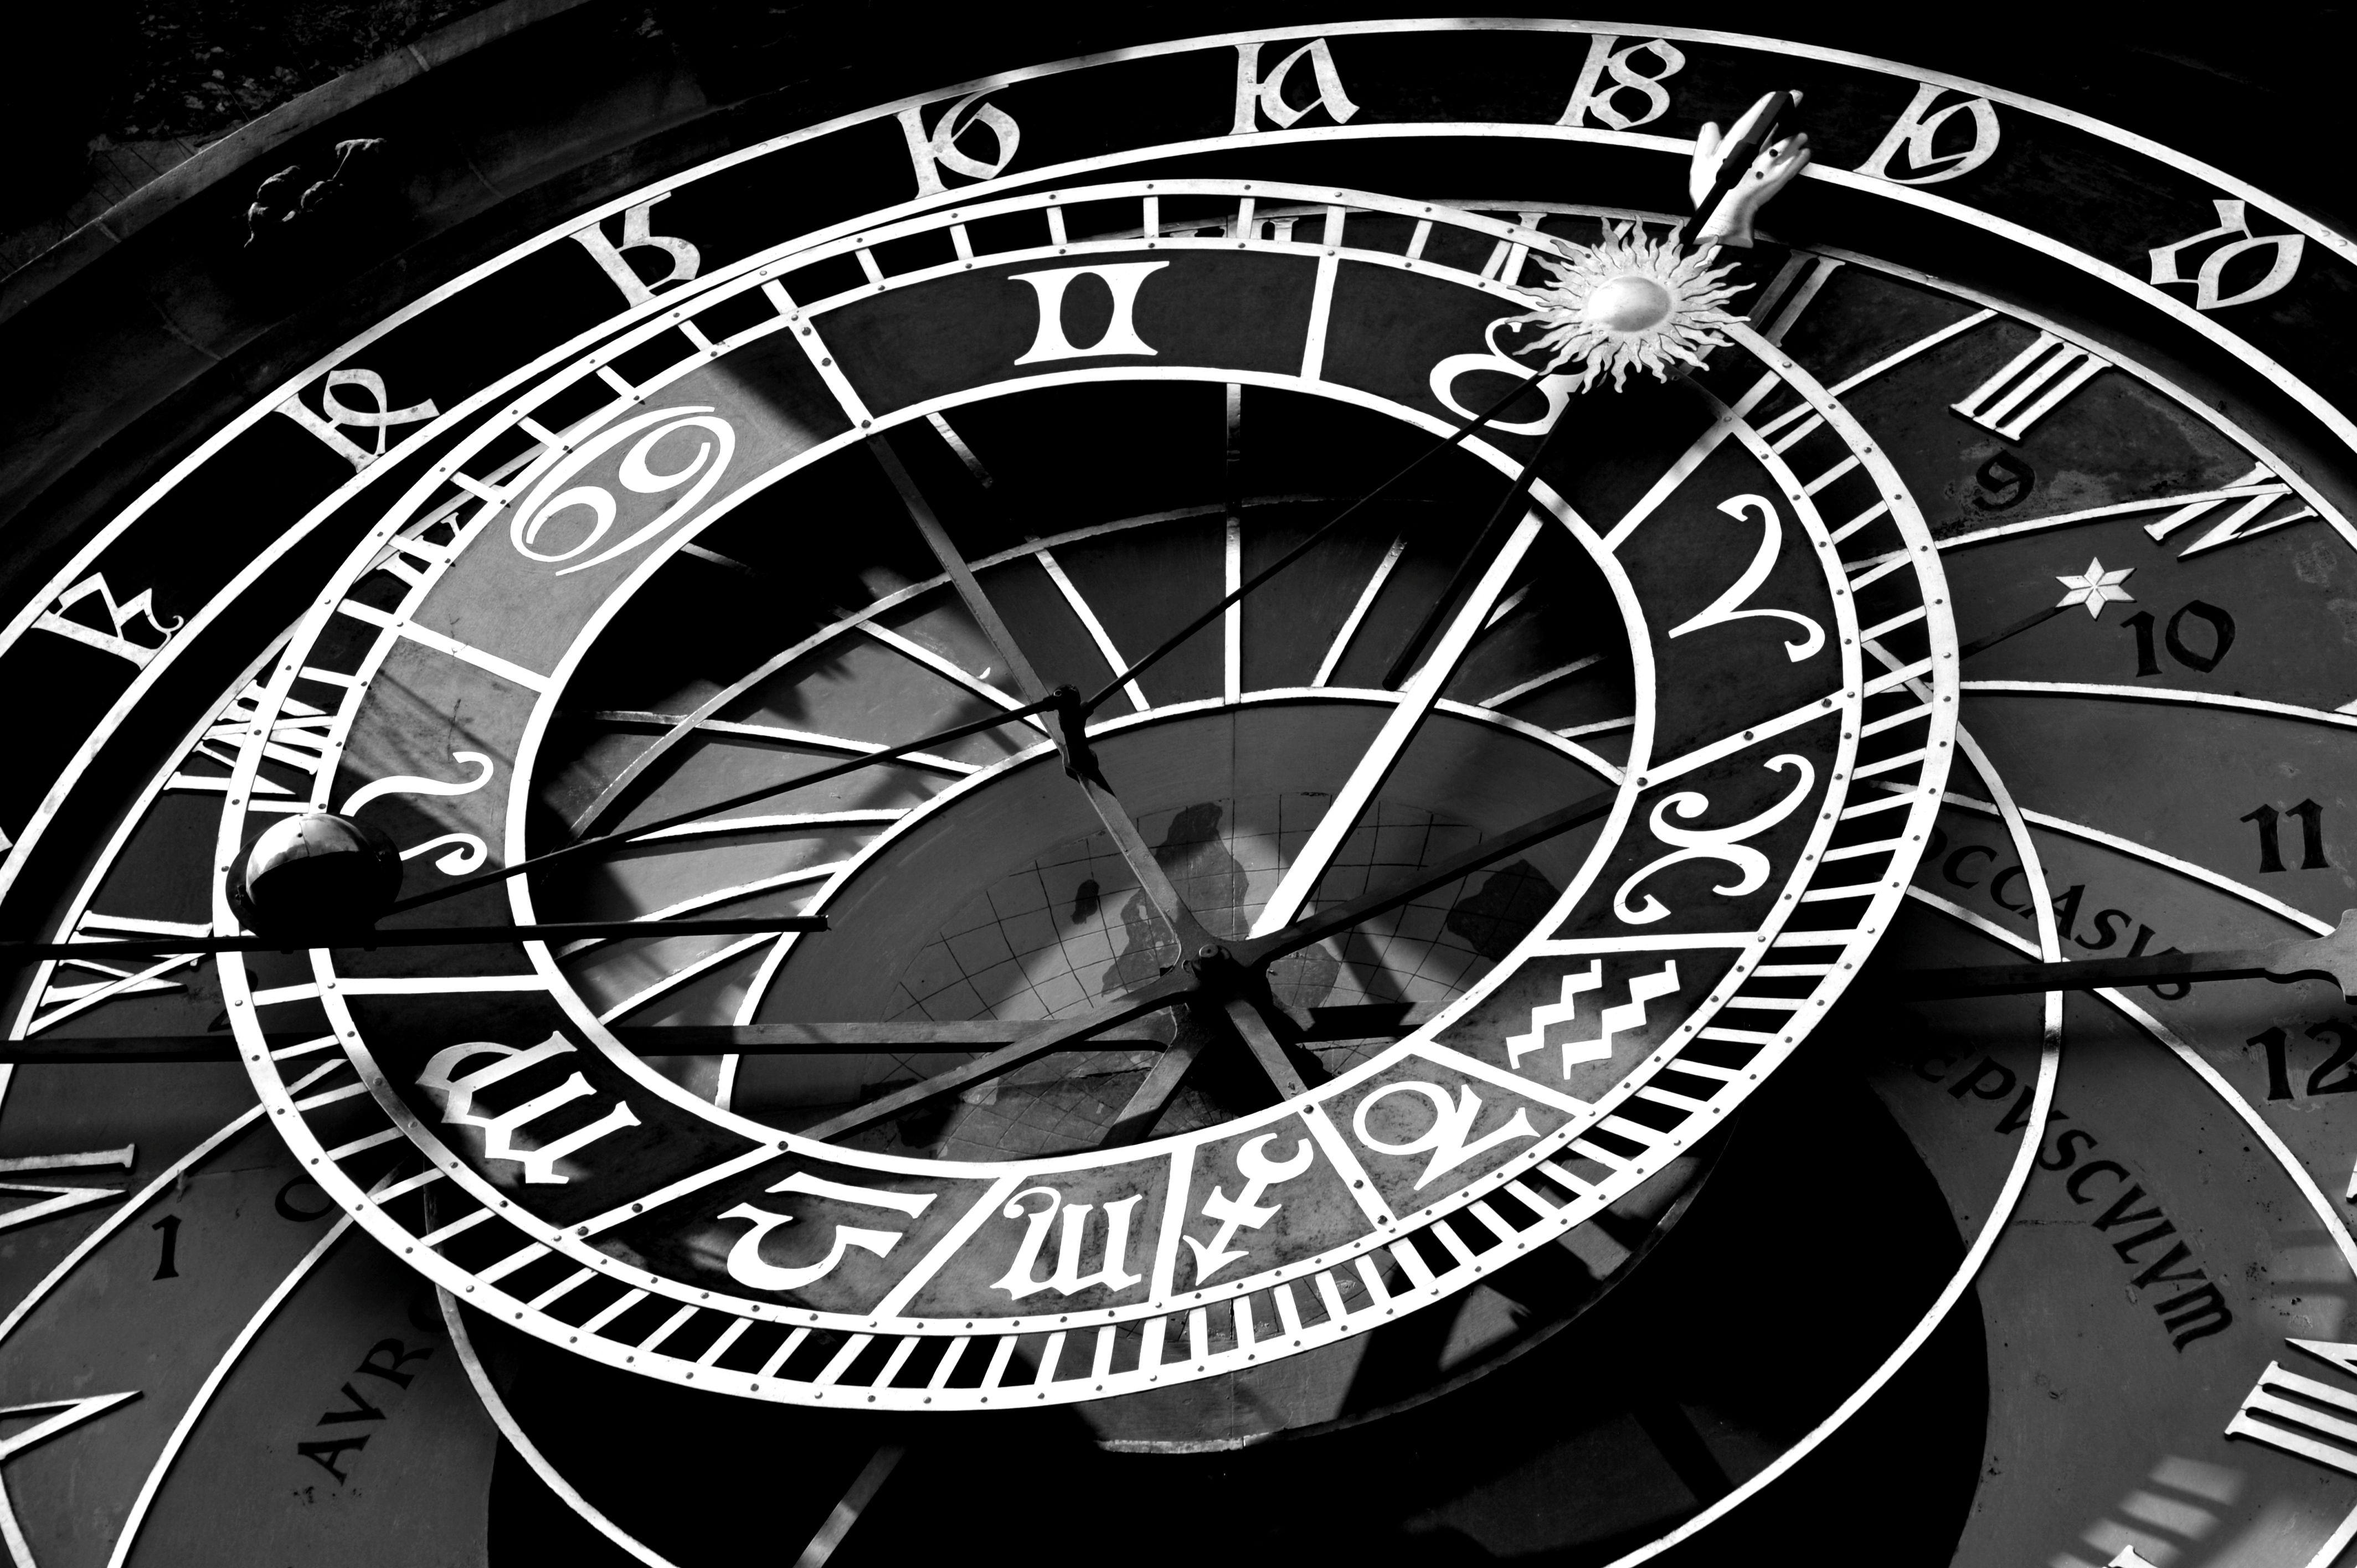 Astronomical Clock Tattoo: The Prague Astronomical Clock Or Prague Orloj As The